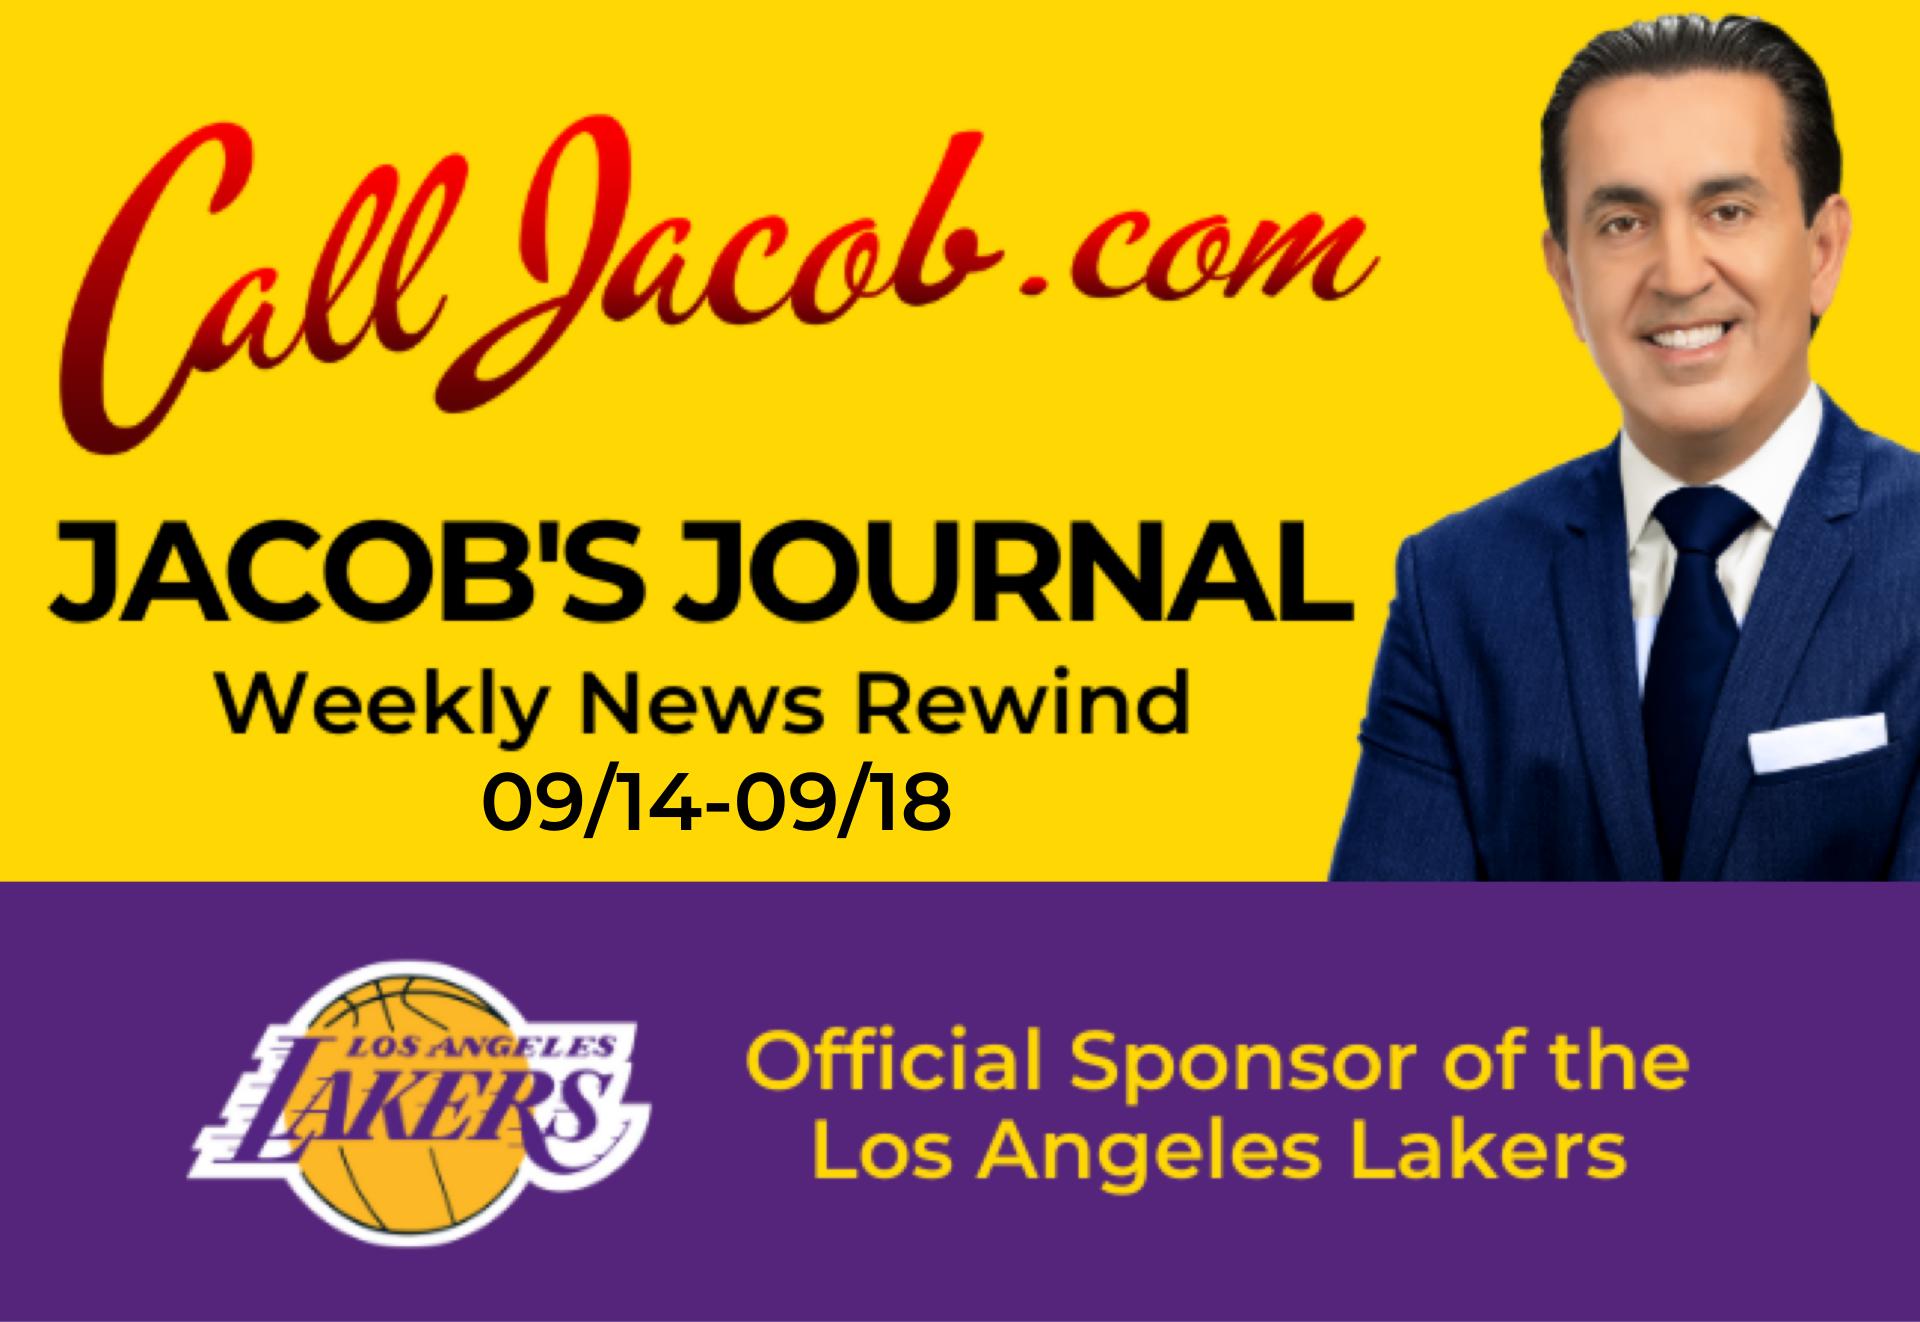 JacobsJournalWeeklyNewsRewind-09-14_09-18